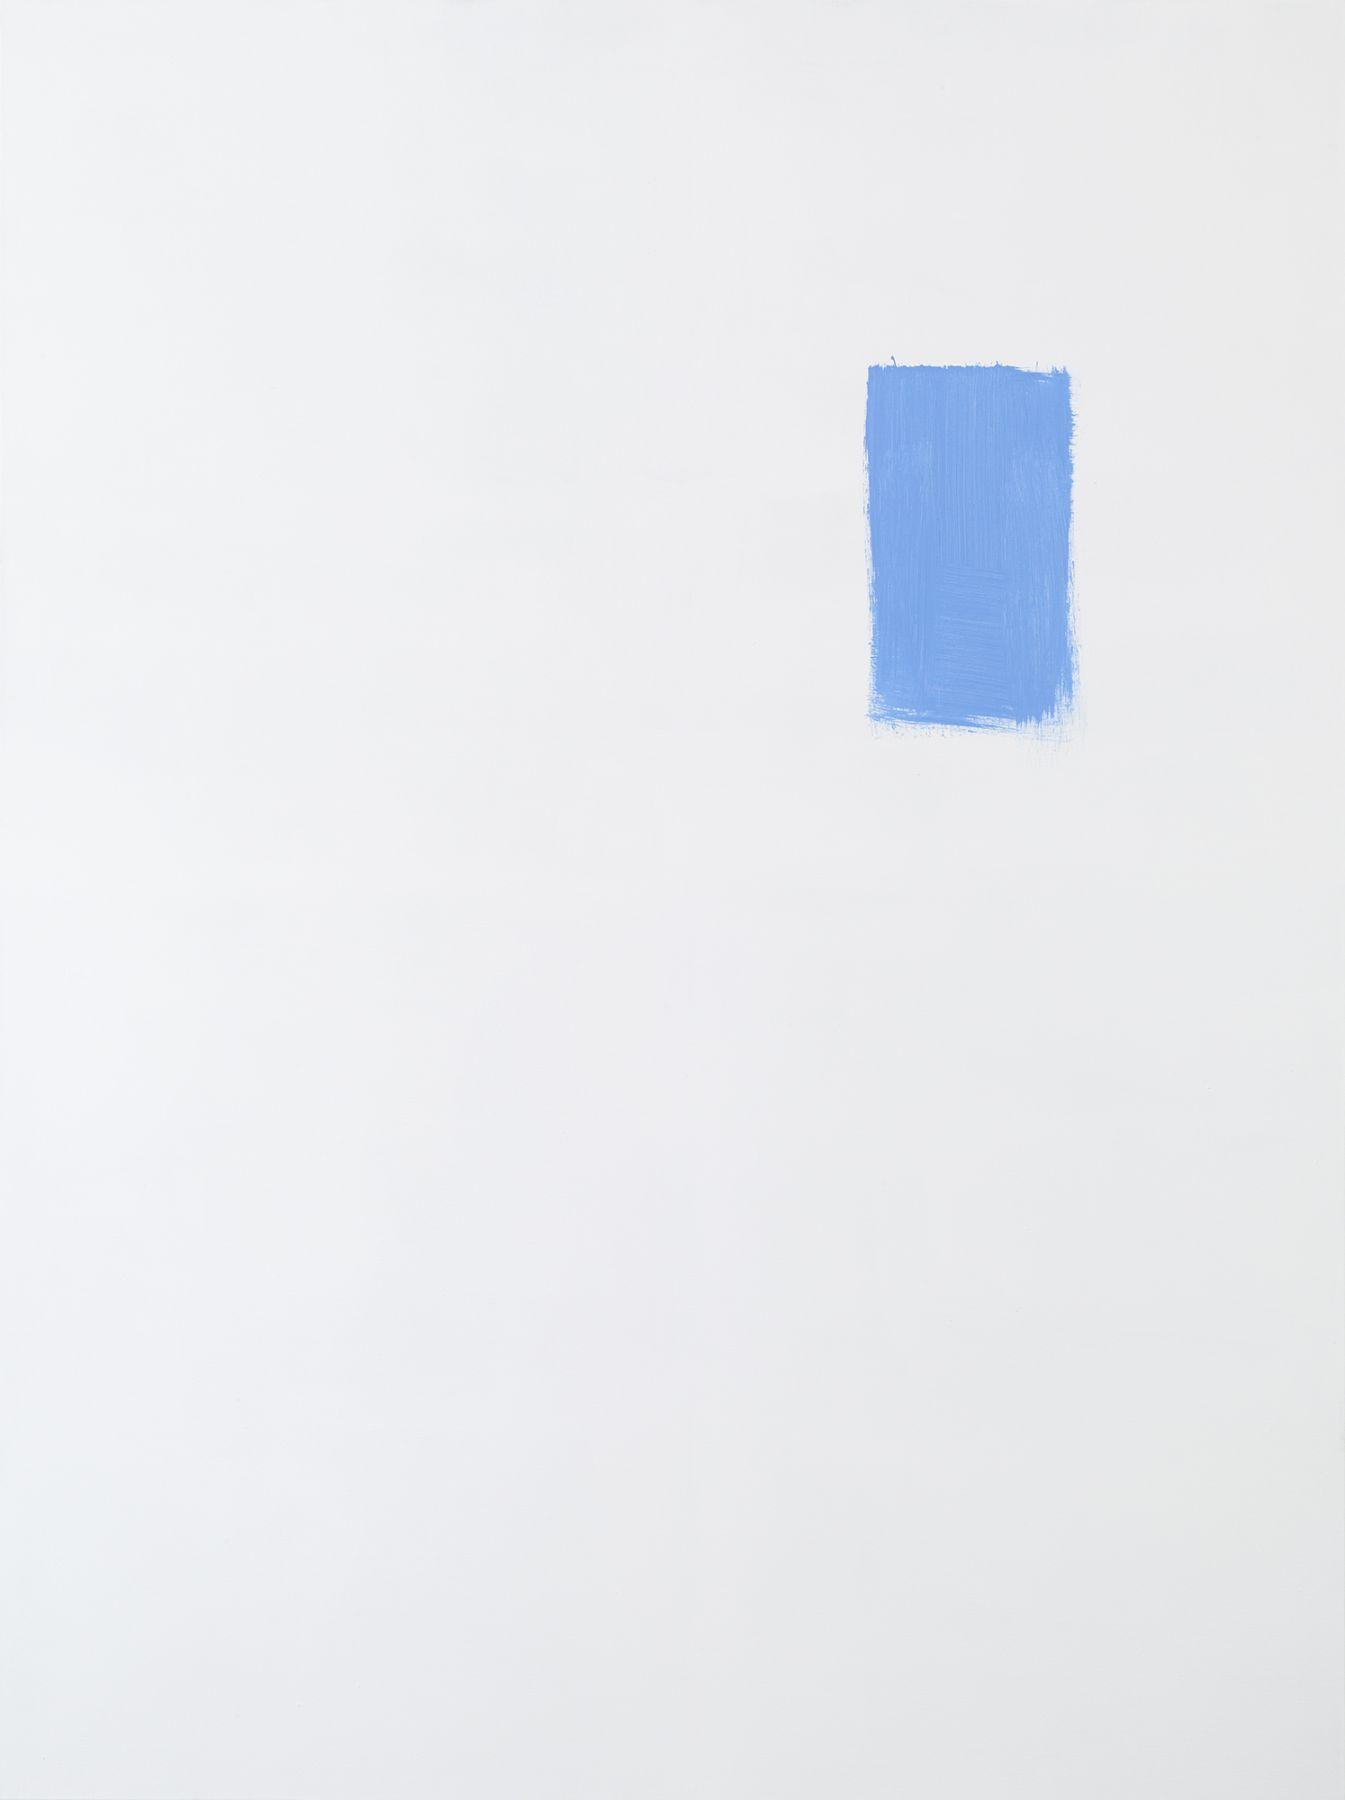 Michael Krebber MK.298, 2015 Acrylic on canvas  78 3/4 x 59 1/8 inches (200 x 150.2 cm)